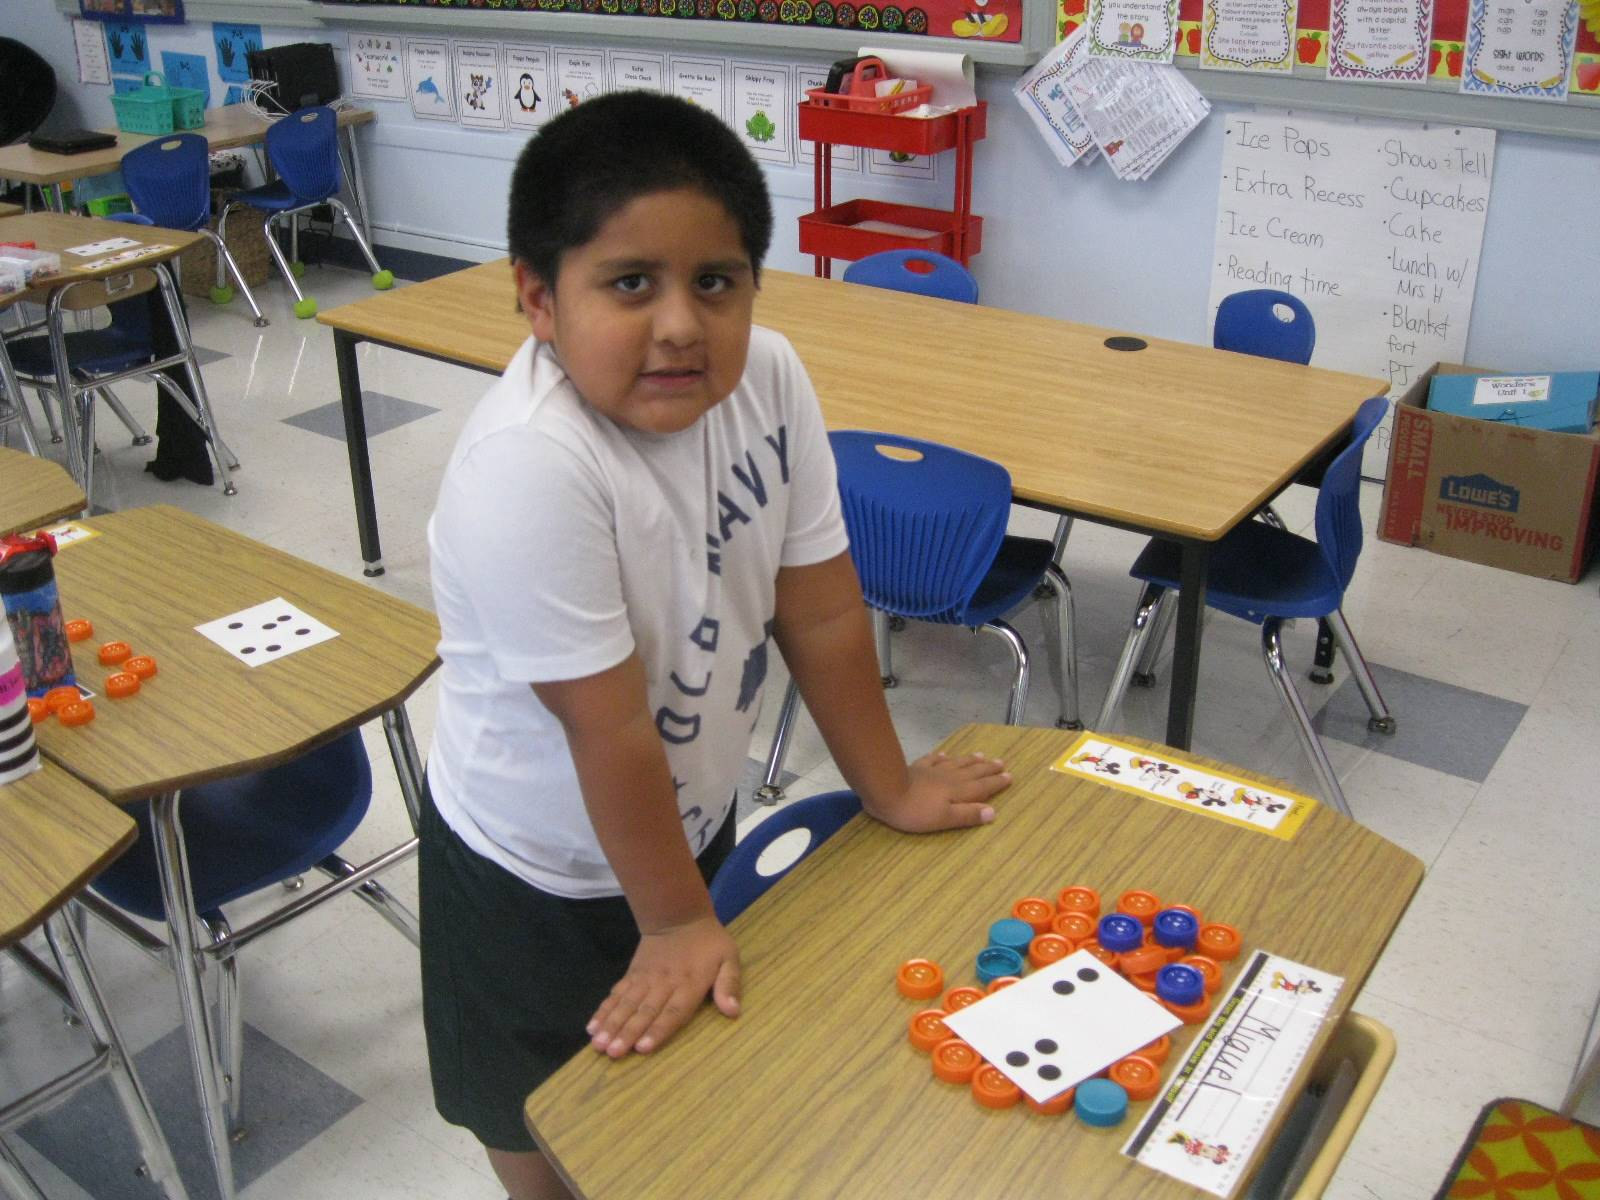 A student demonstrates a math problem.